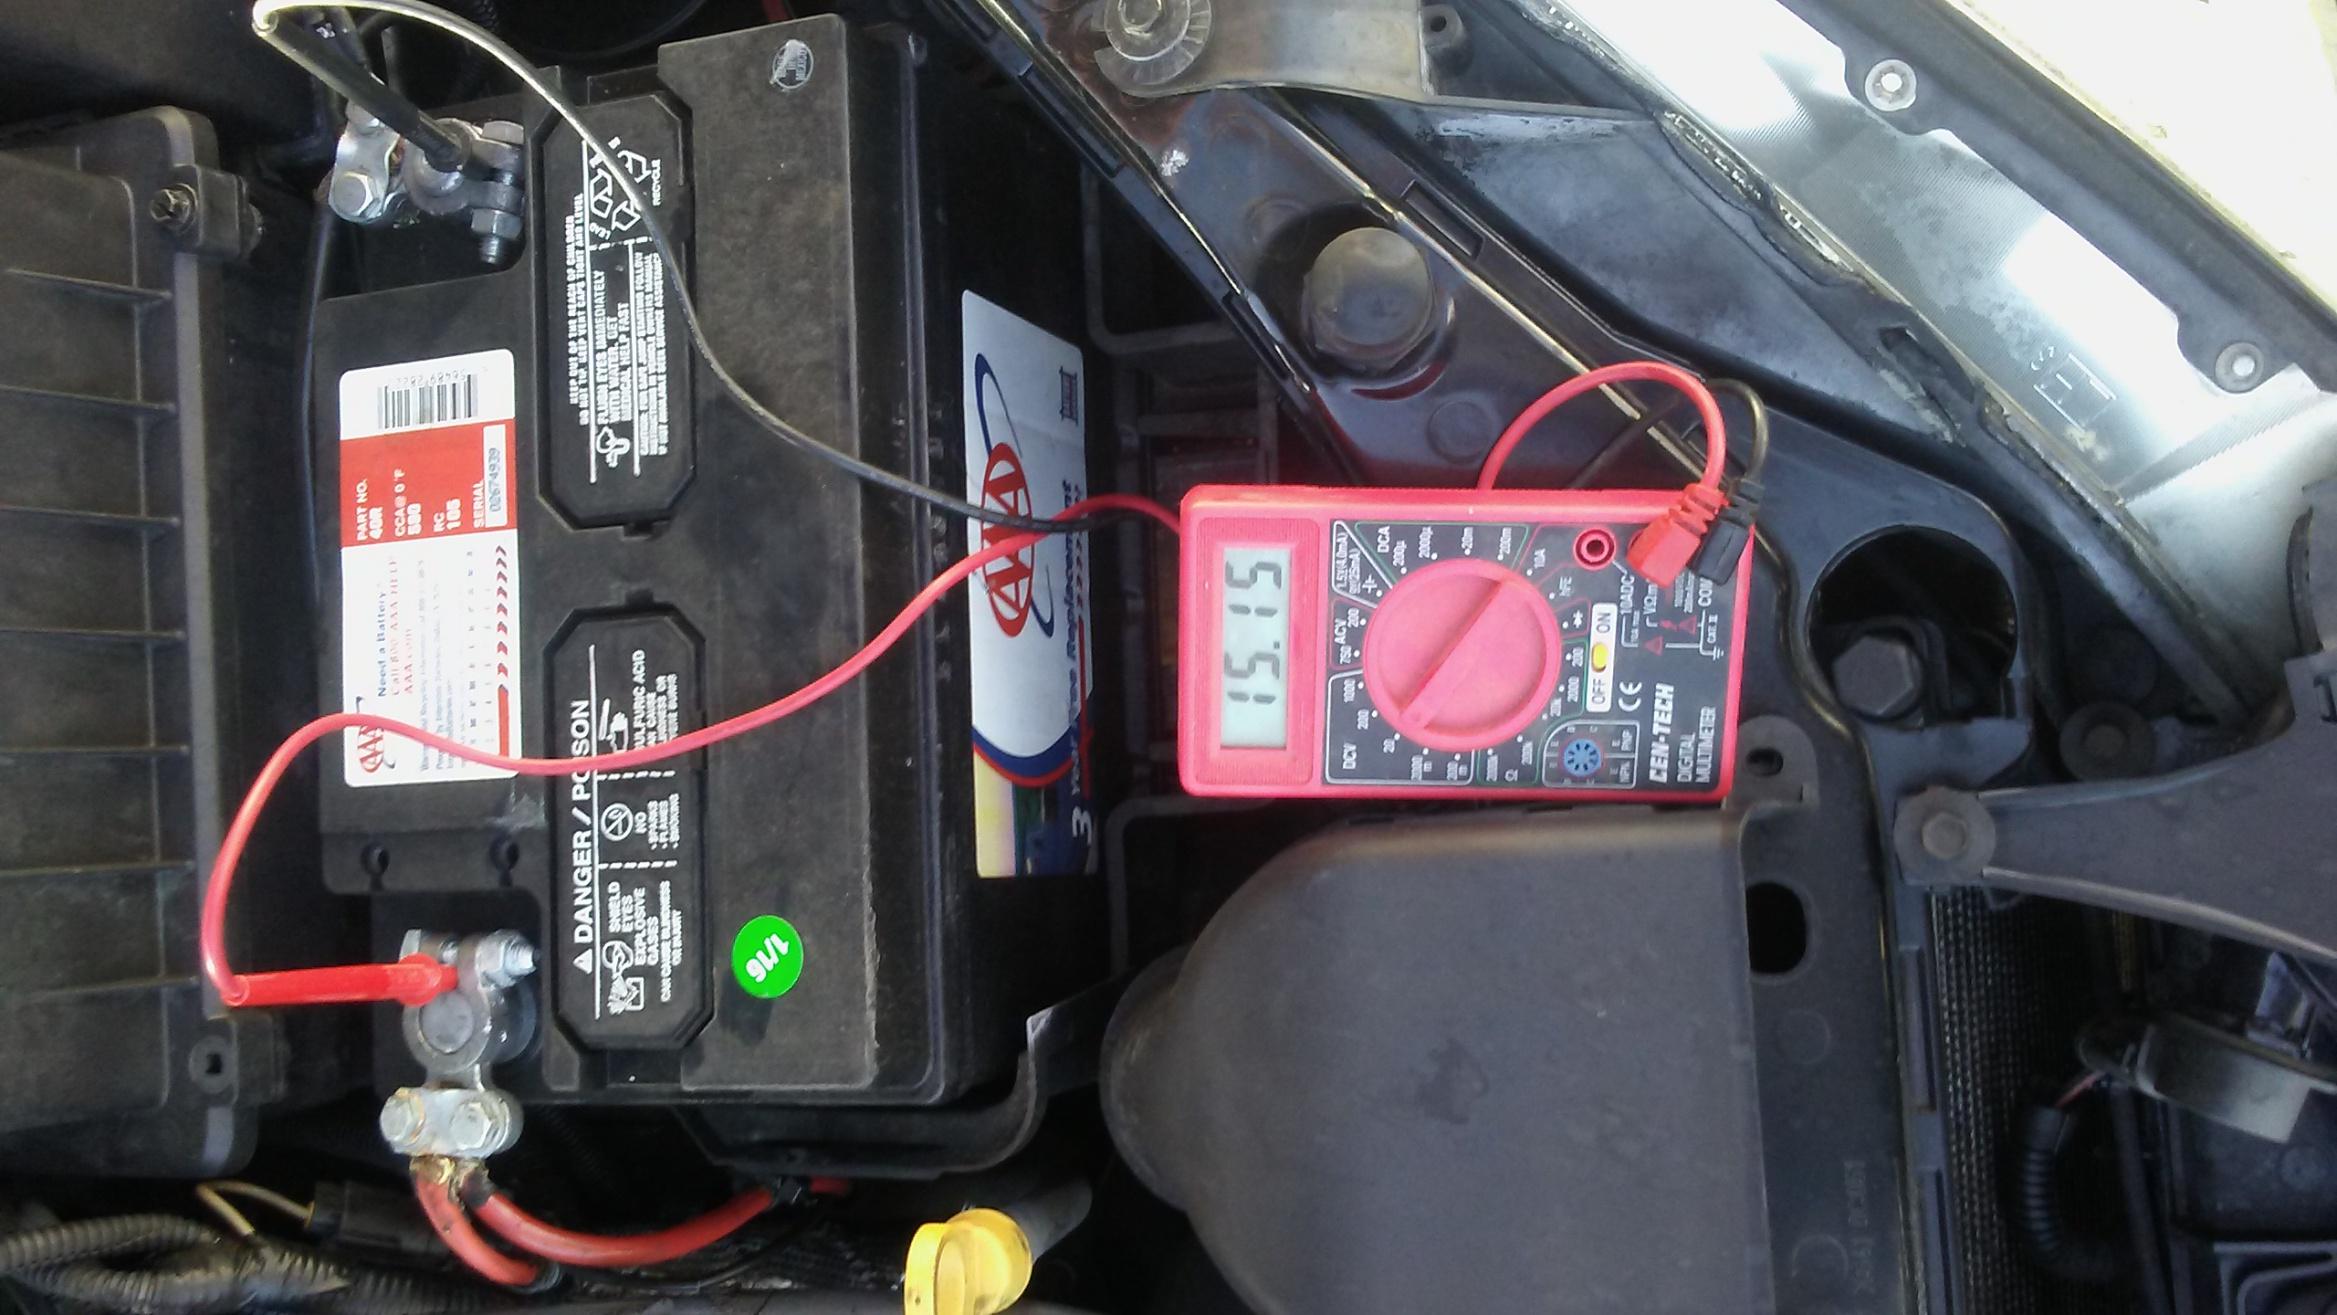 intermittent start issue on 2001 ford zx3 hatchback-15_15v-car-foot-gas.jpg